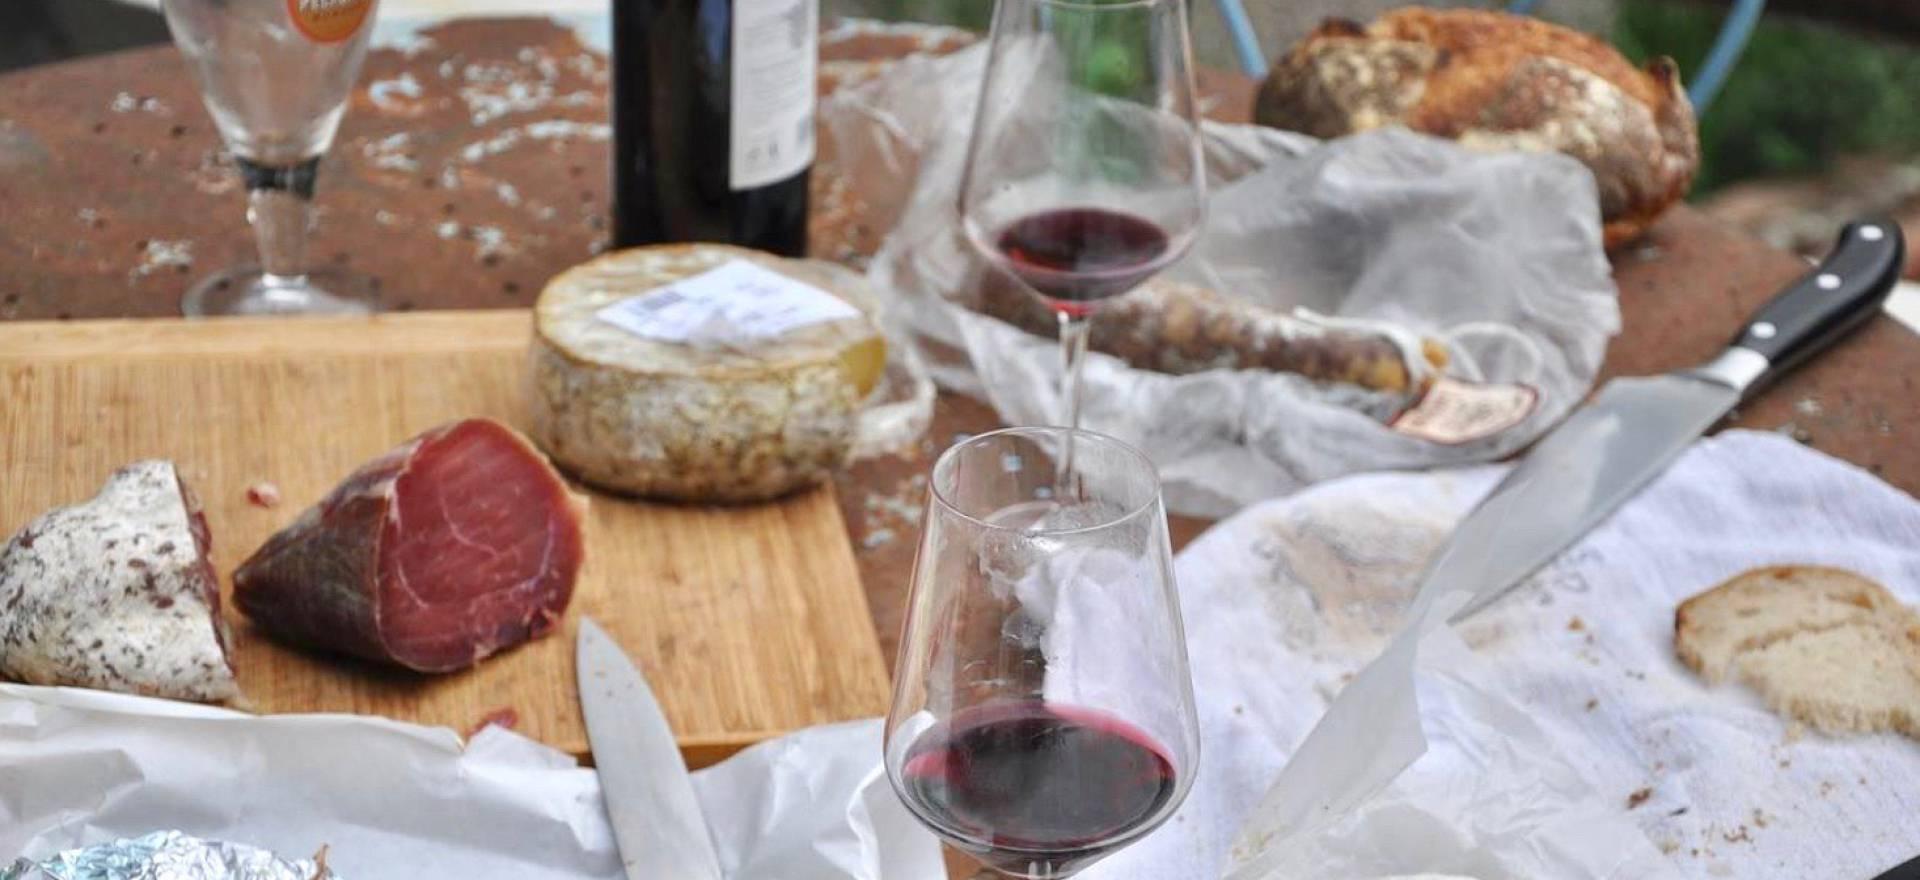 Agriturismo Toscane Agriturismo met restaurant nabij de Toscaanse kust